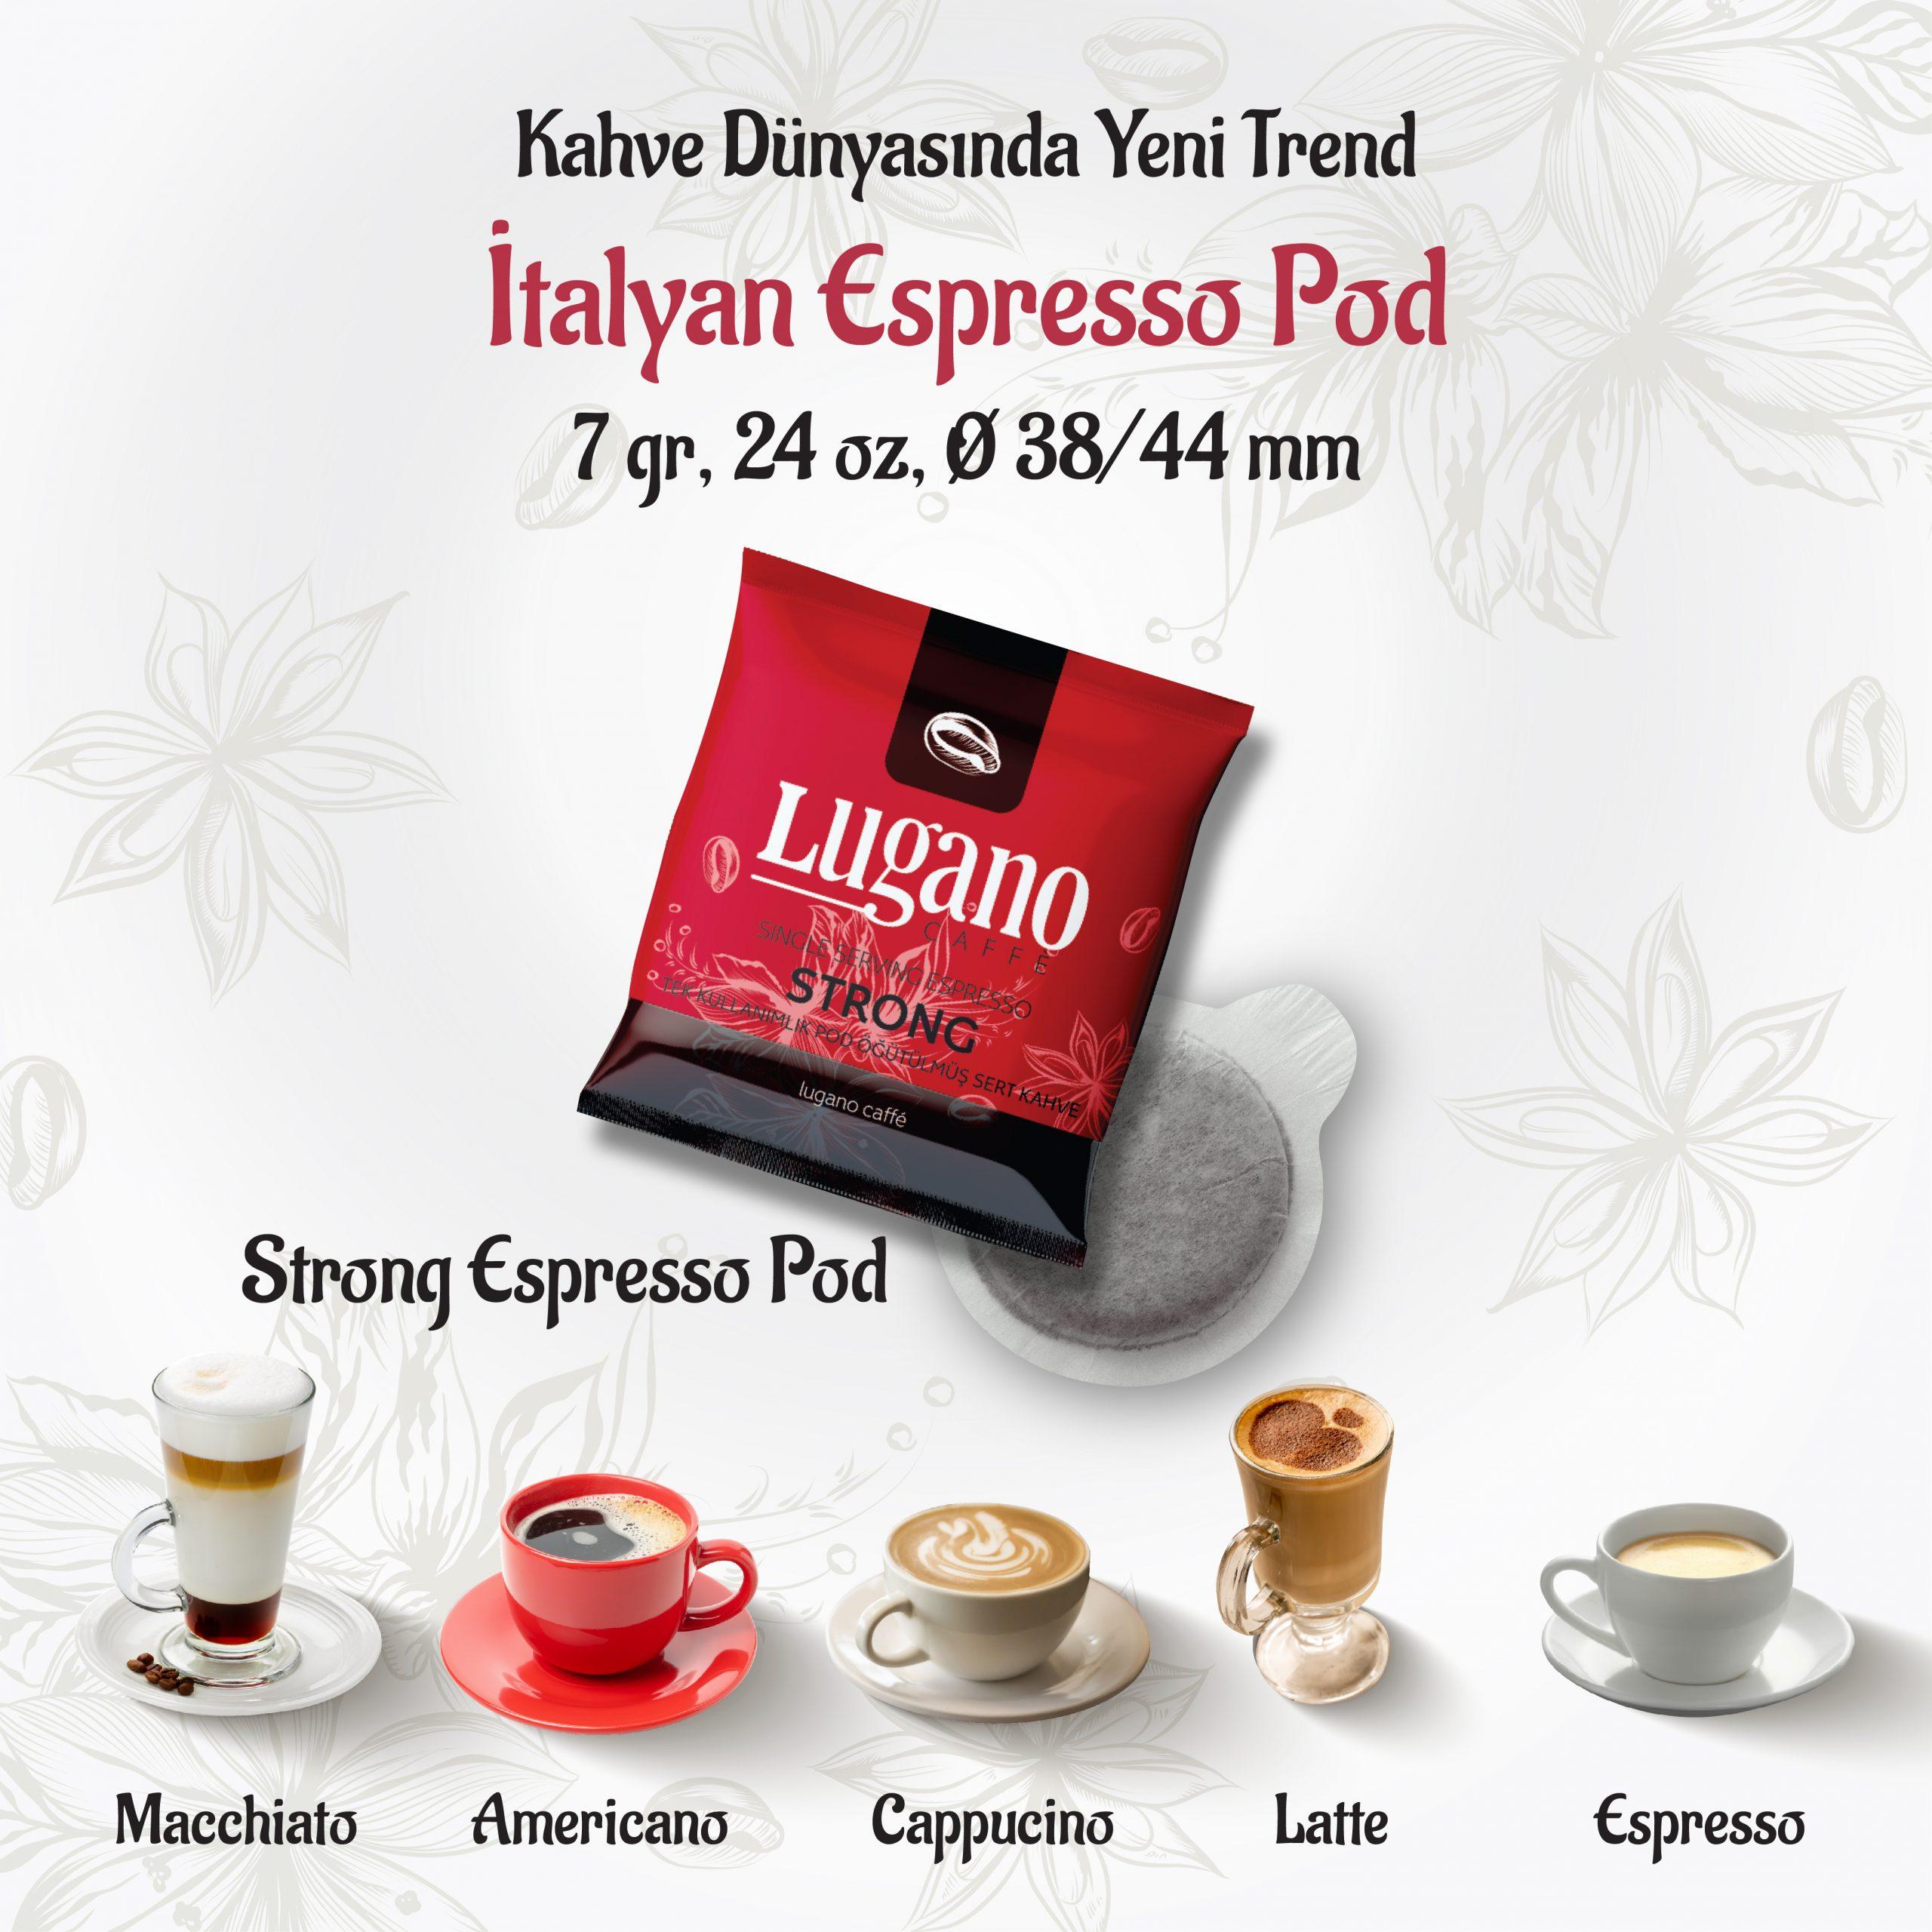 Strong Espresso Pod